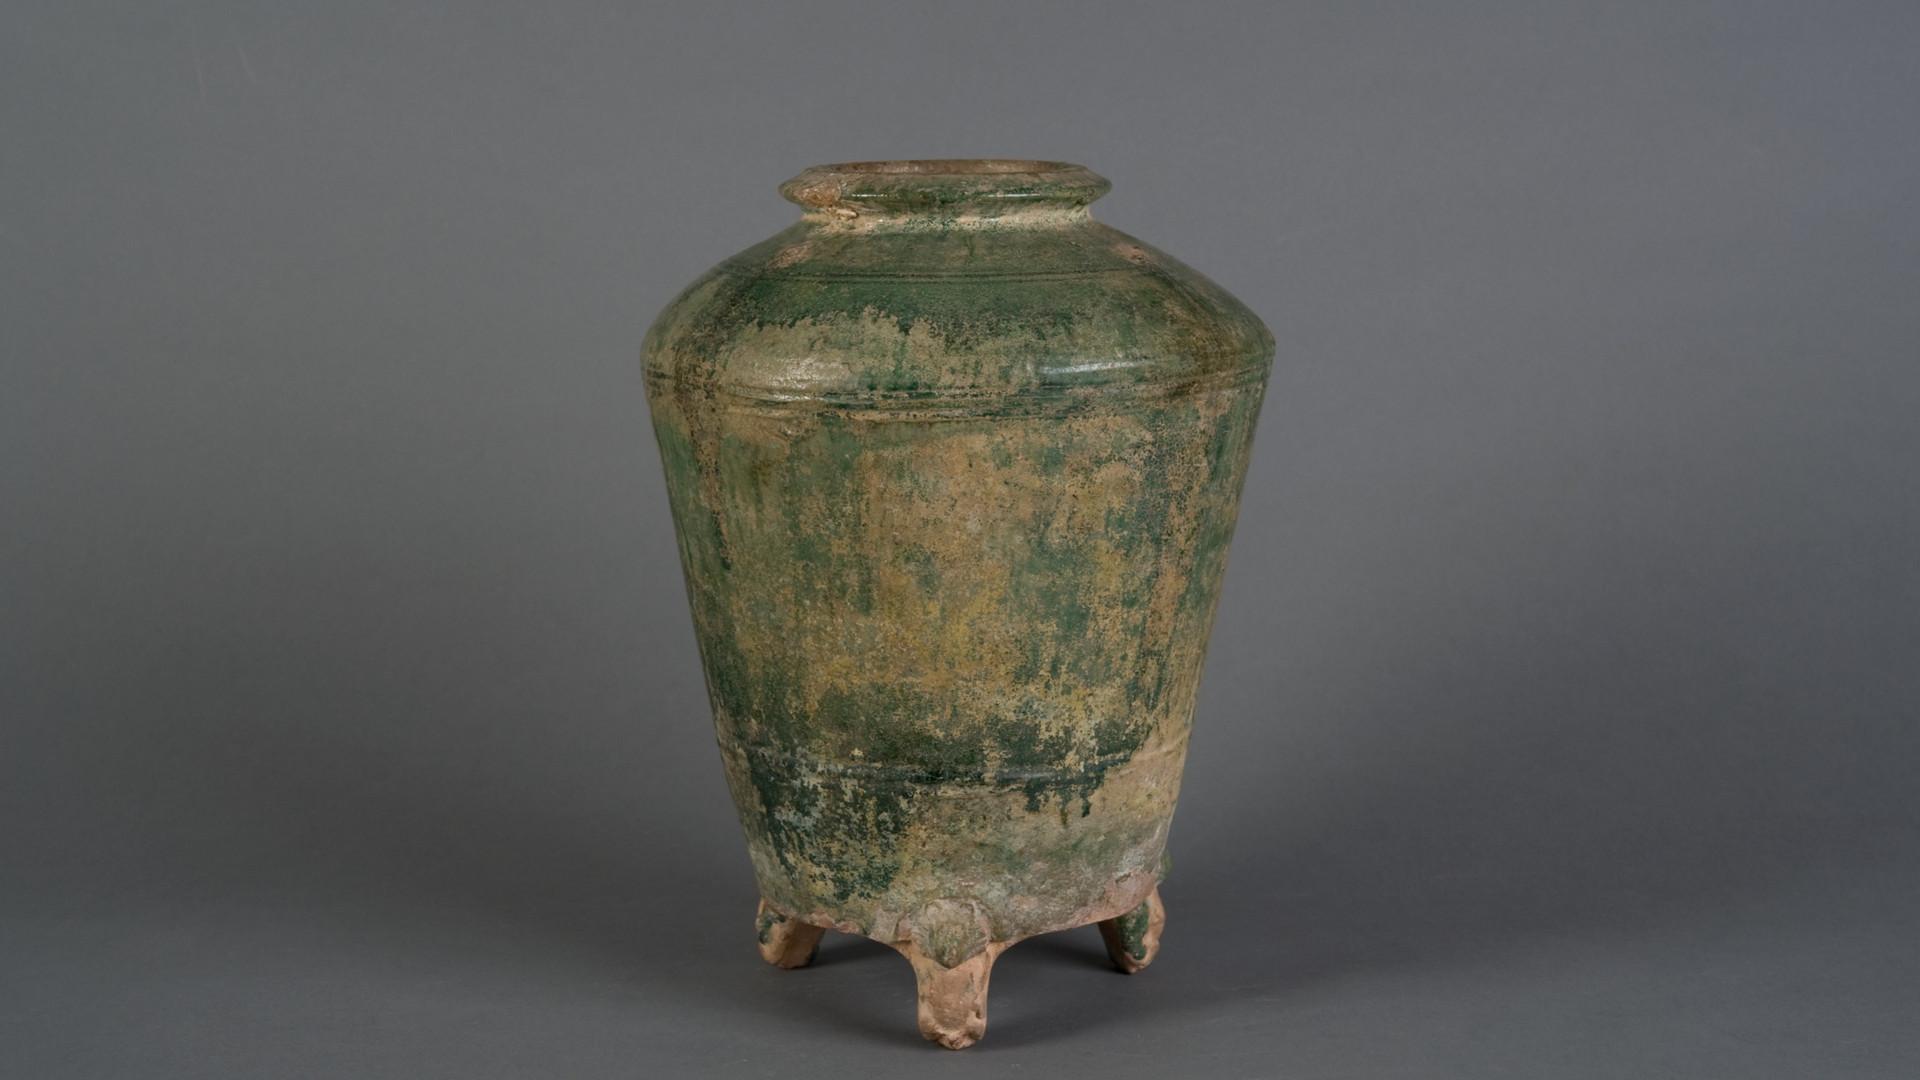 Part 2. Proto-Celadon Ceramics